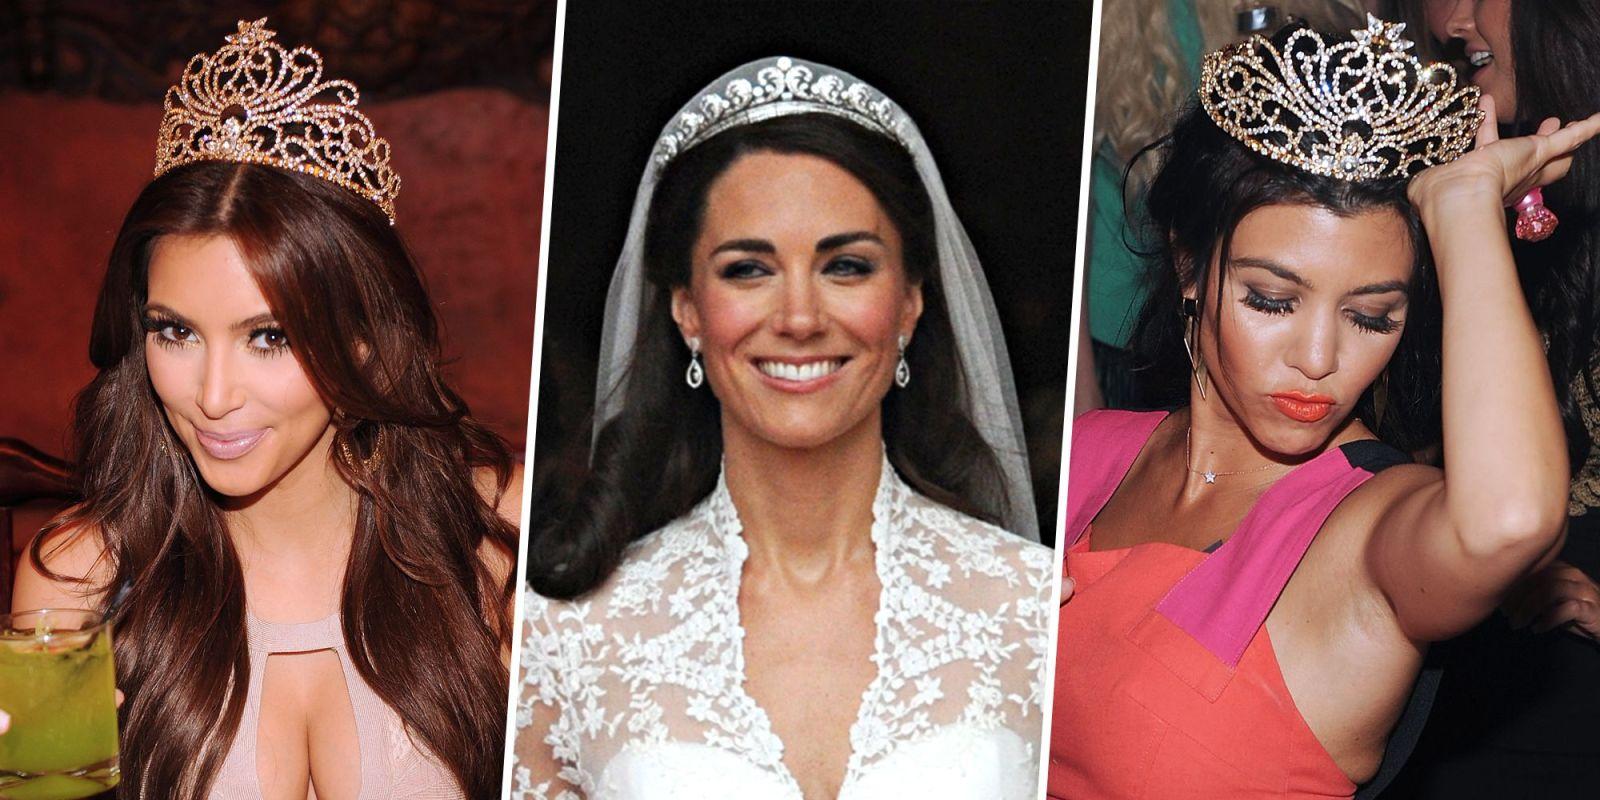 30 Surprising Similarities Between The Royal Family And The Kardashians